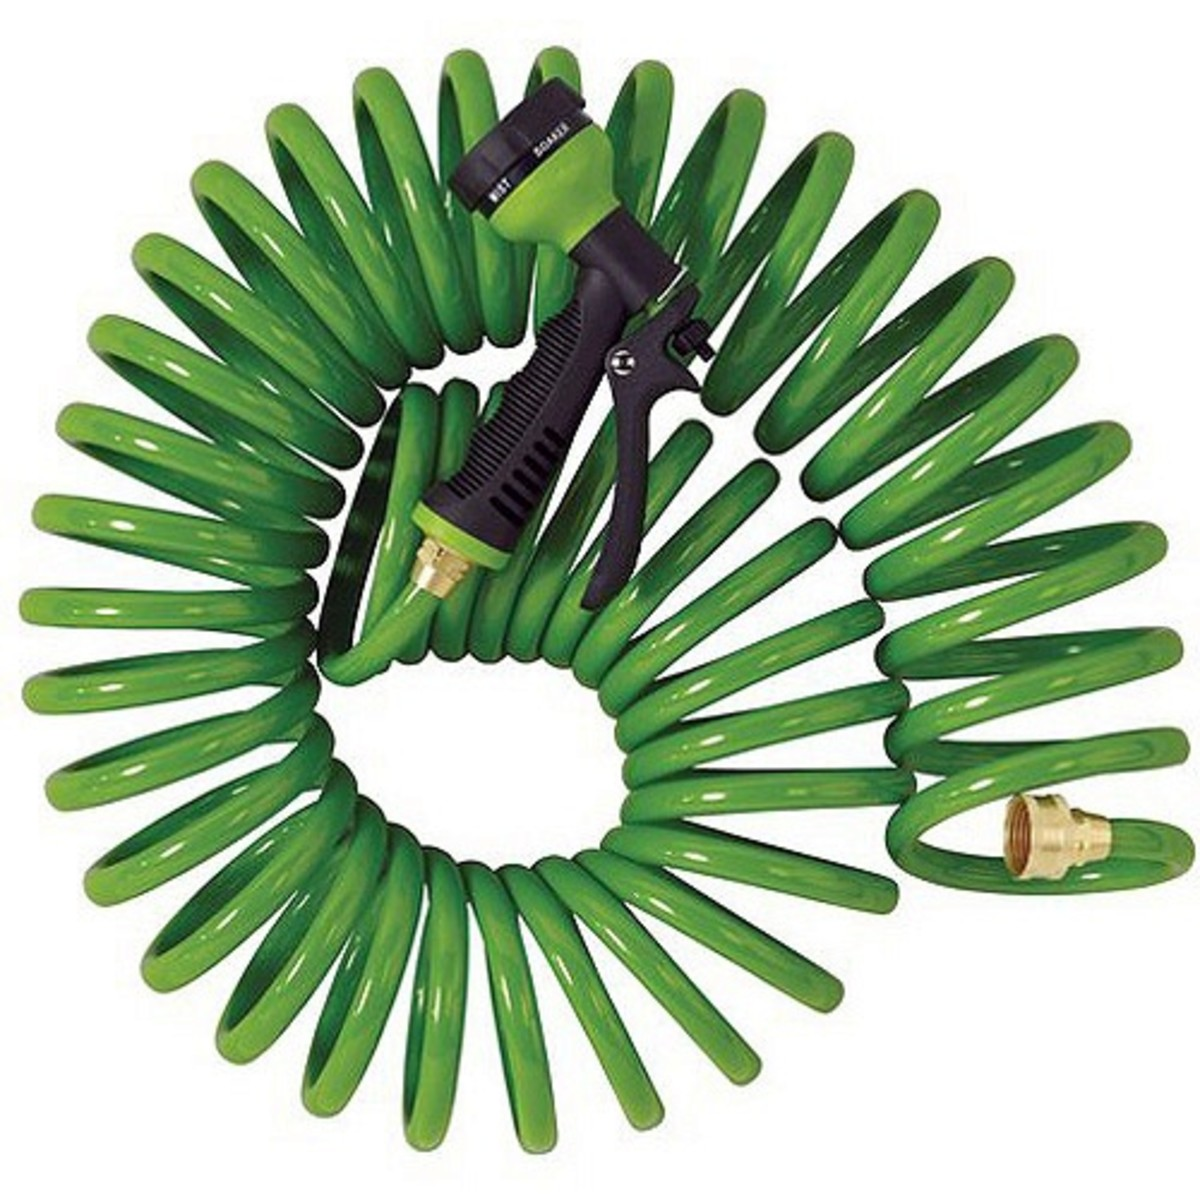 Orbit 50-foot hose with Pistol Nozzle